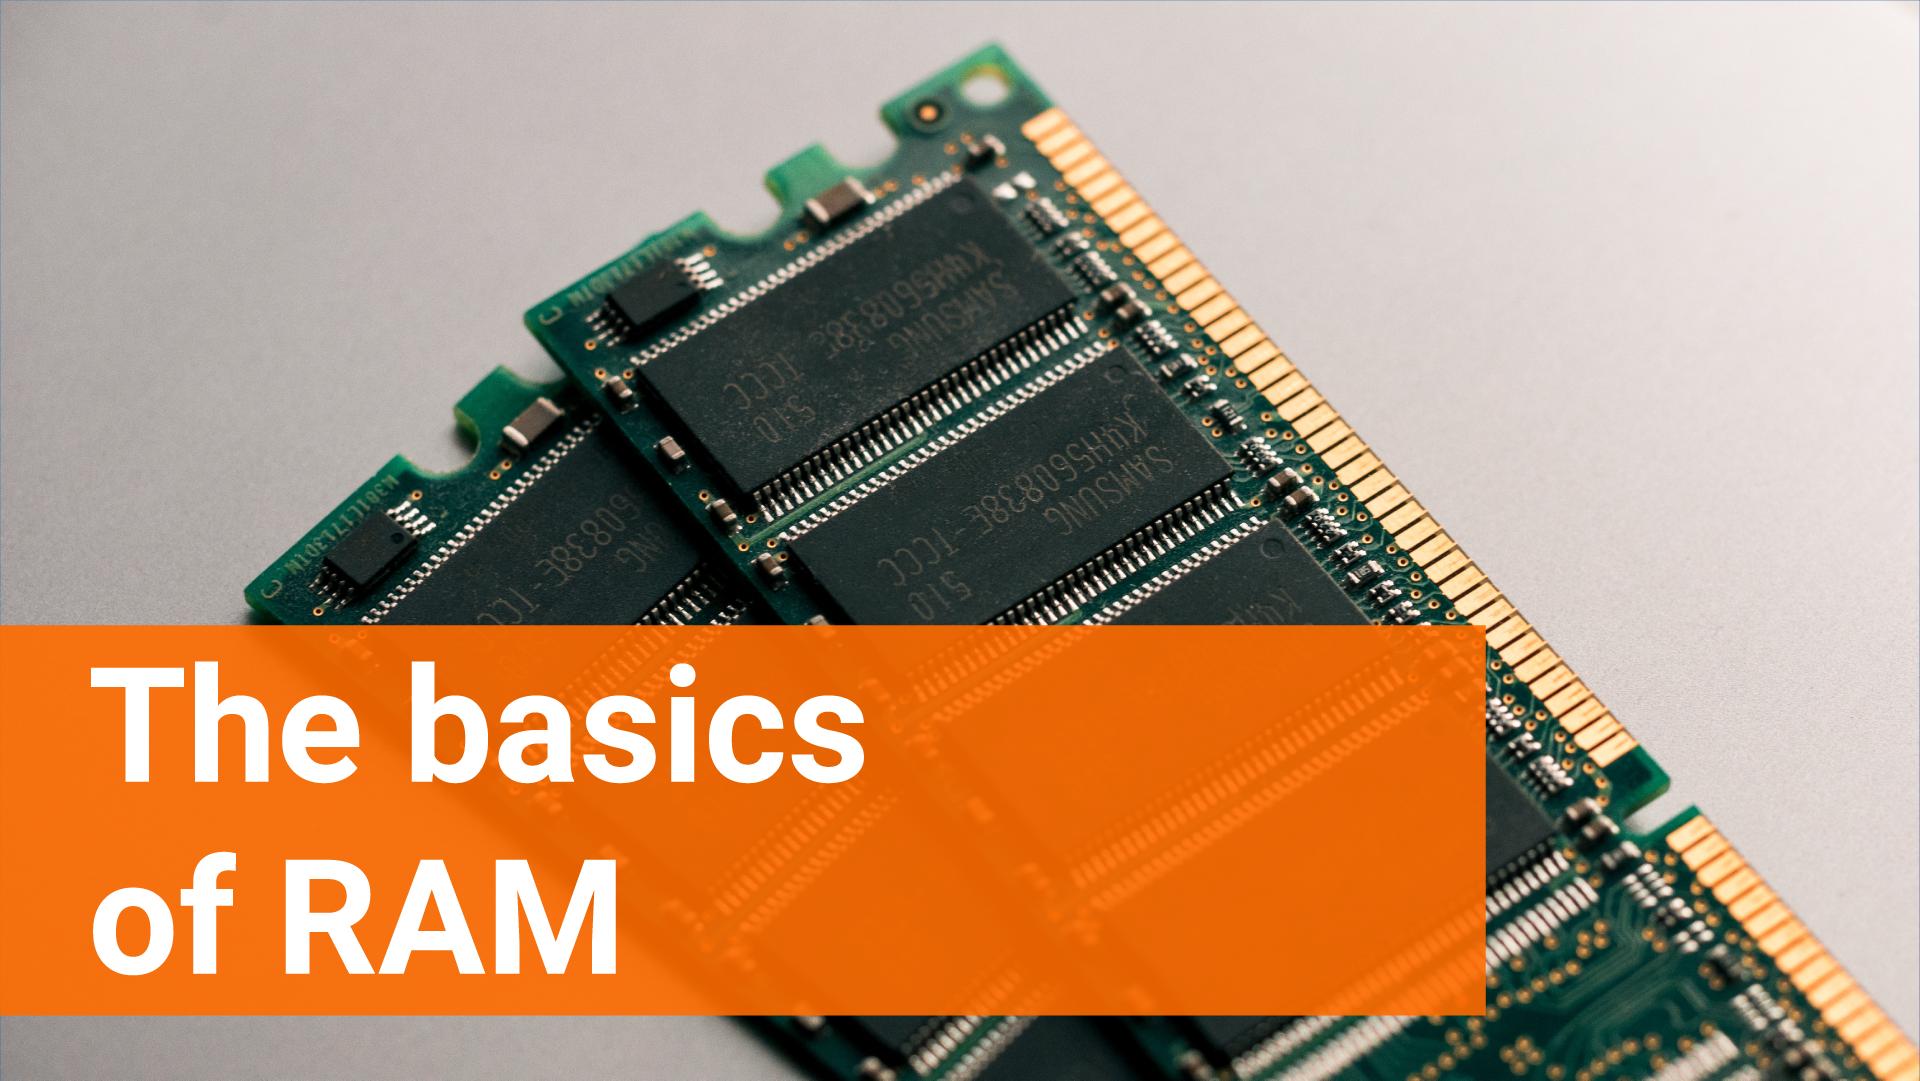 Basics of RAM